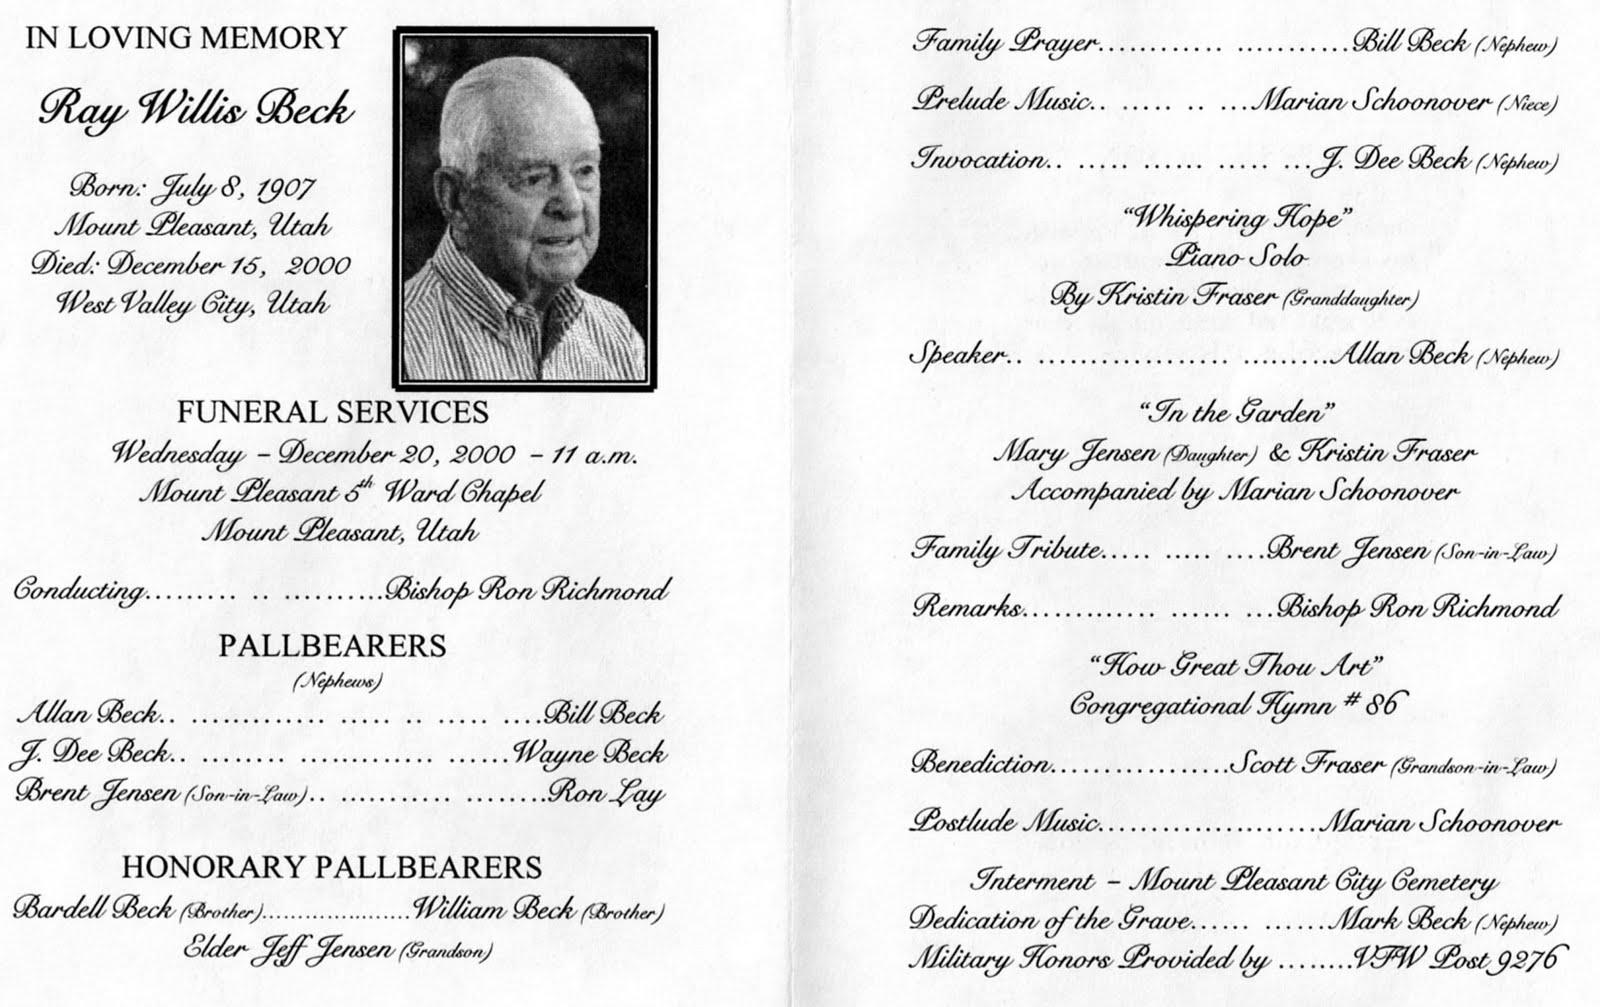 Spanish Funeral Program Template Program Template Funeral Card Order of Service Memorial Program Funeral Template Ceremony Program